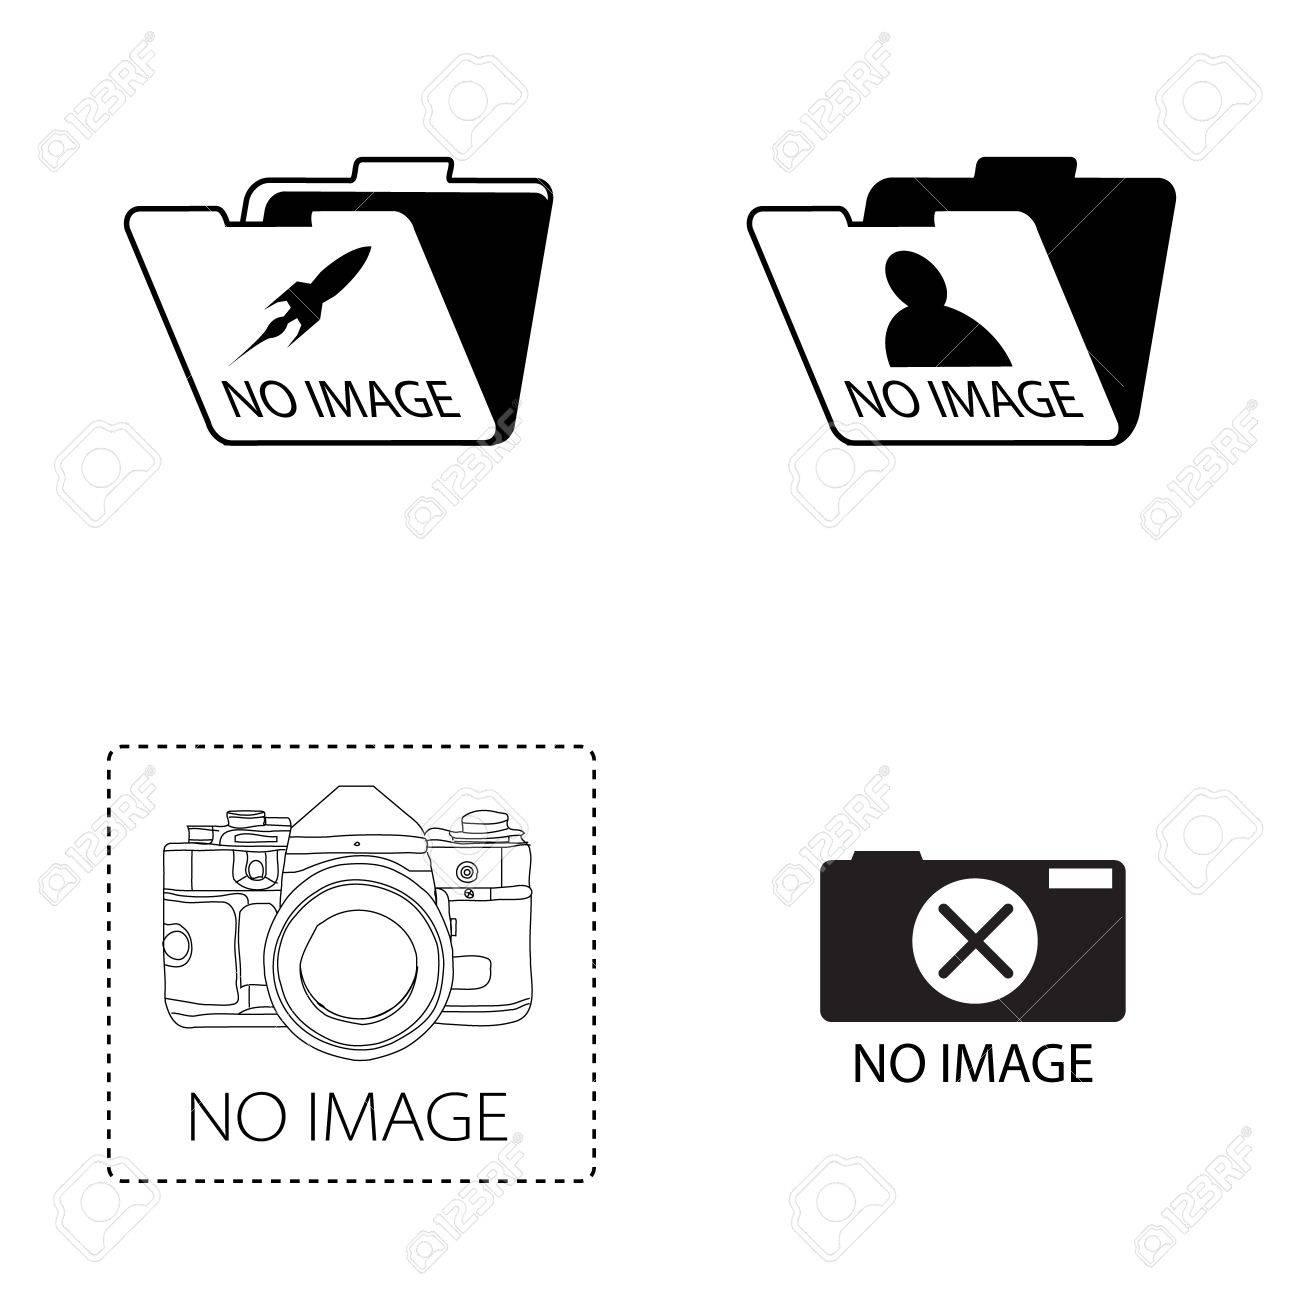 no image  icon set on white background Stock Photo - 17092179